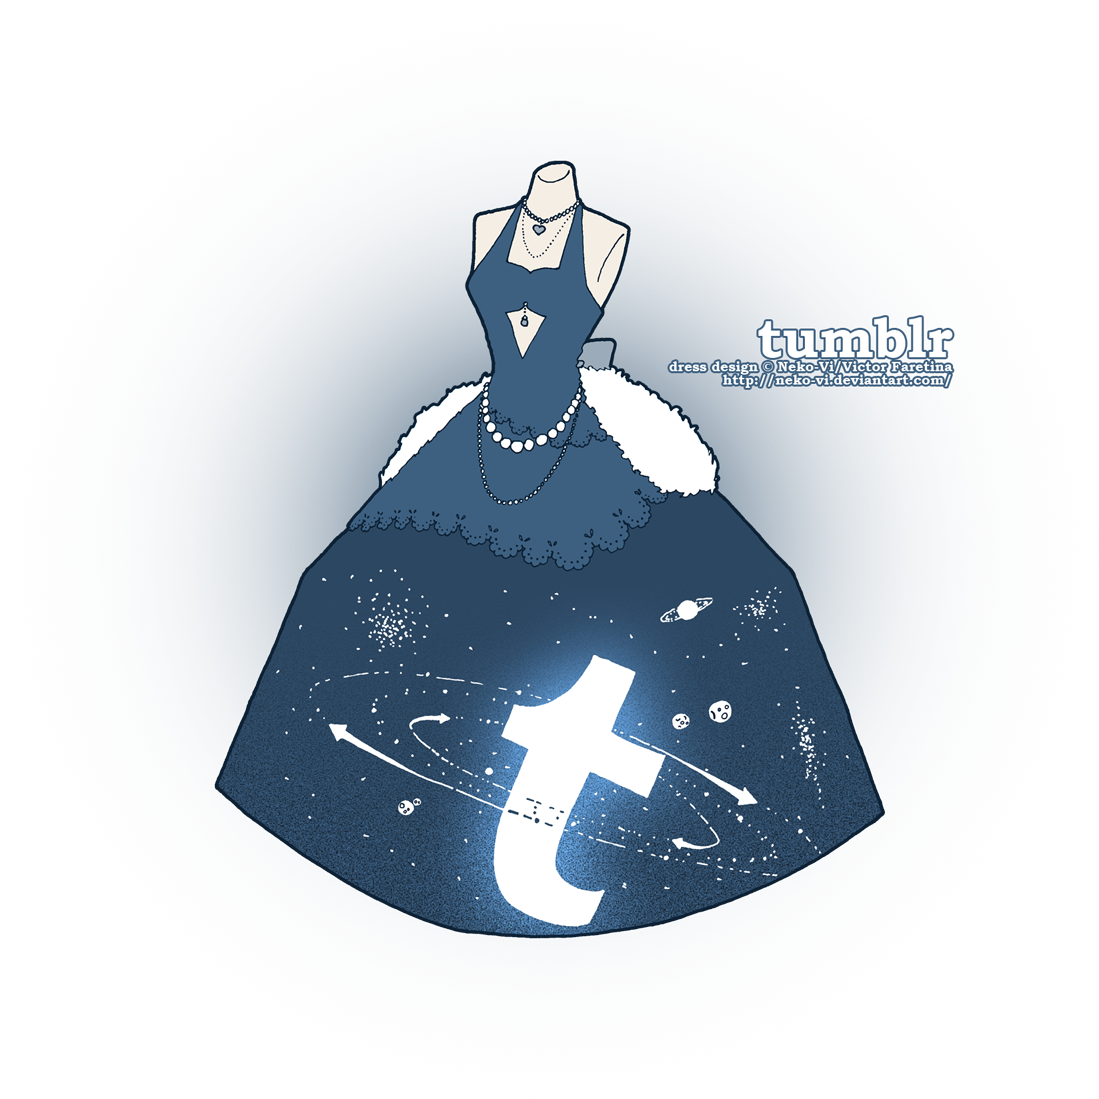 Tumblr in Fashion by Neko-Vi on DeviantArt